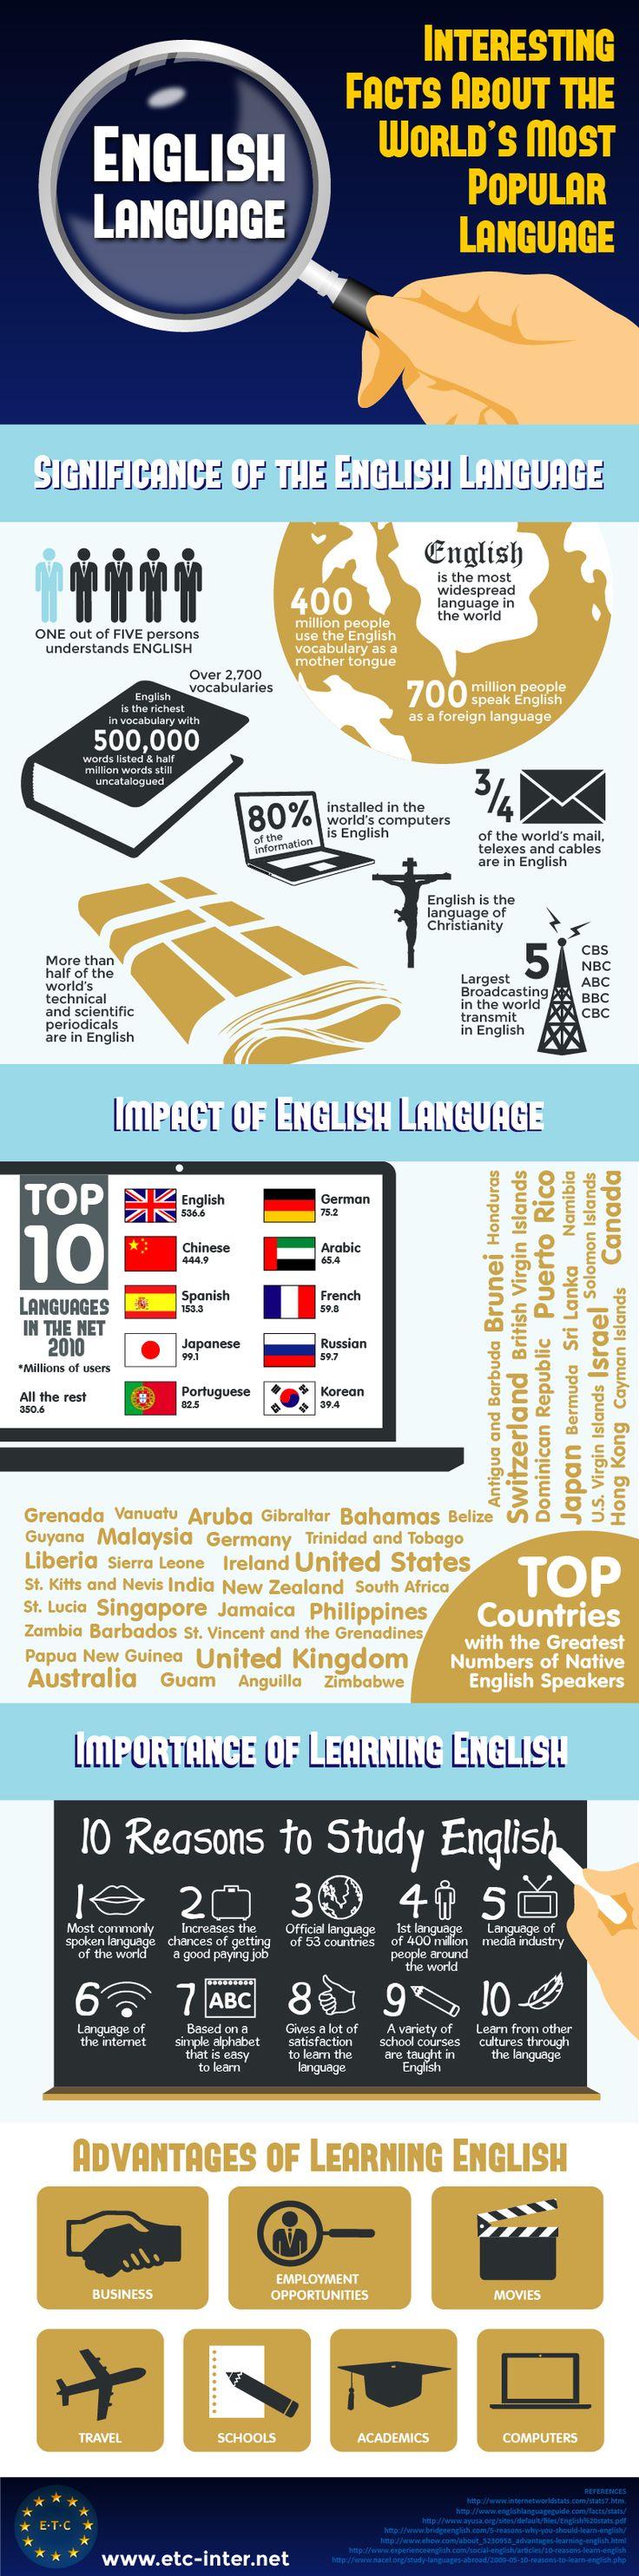 English Language Interesting Facts About The World's Most Popular Language   #Infographic #EnglishLanguage #Facts